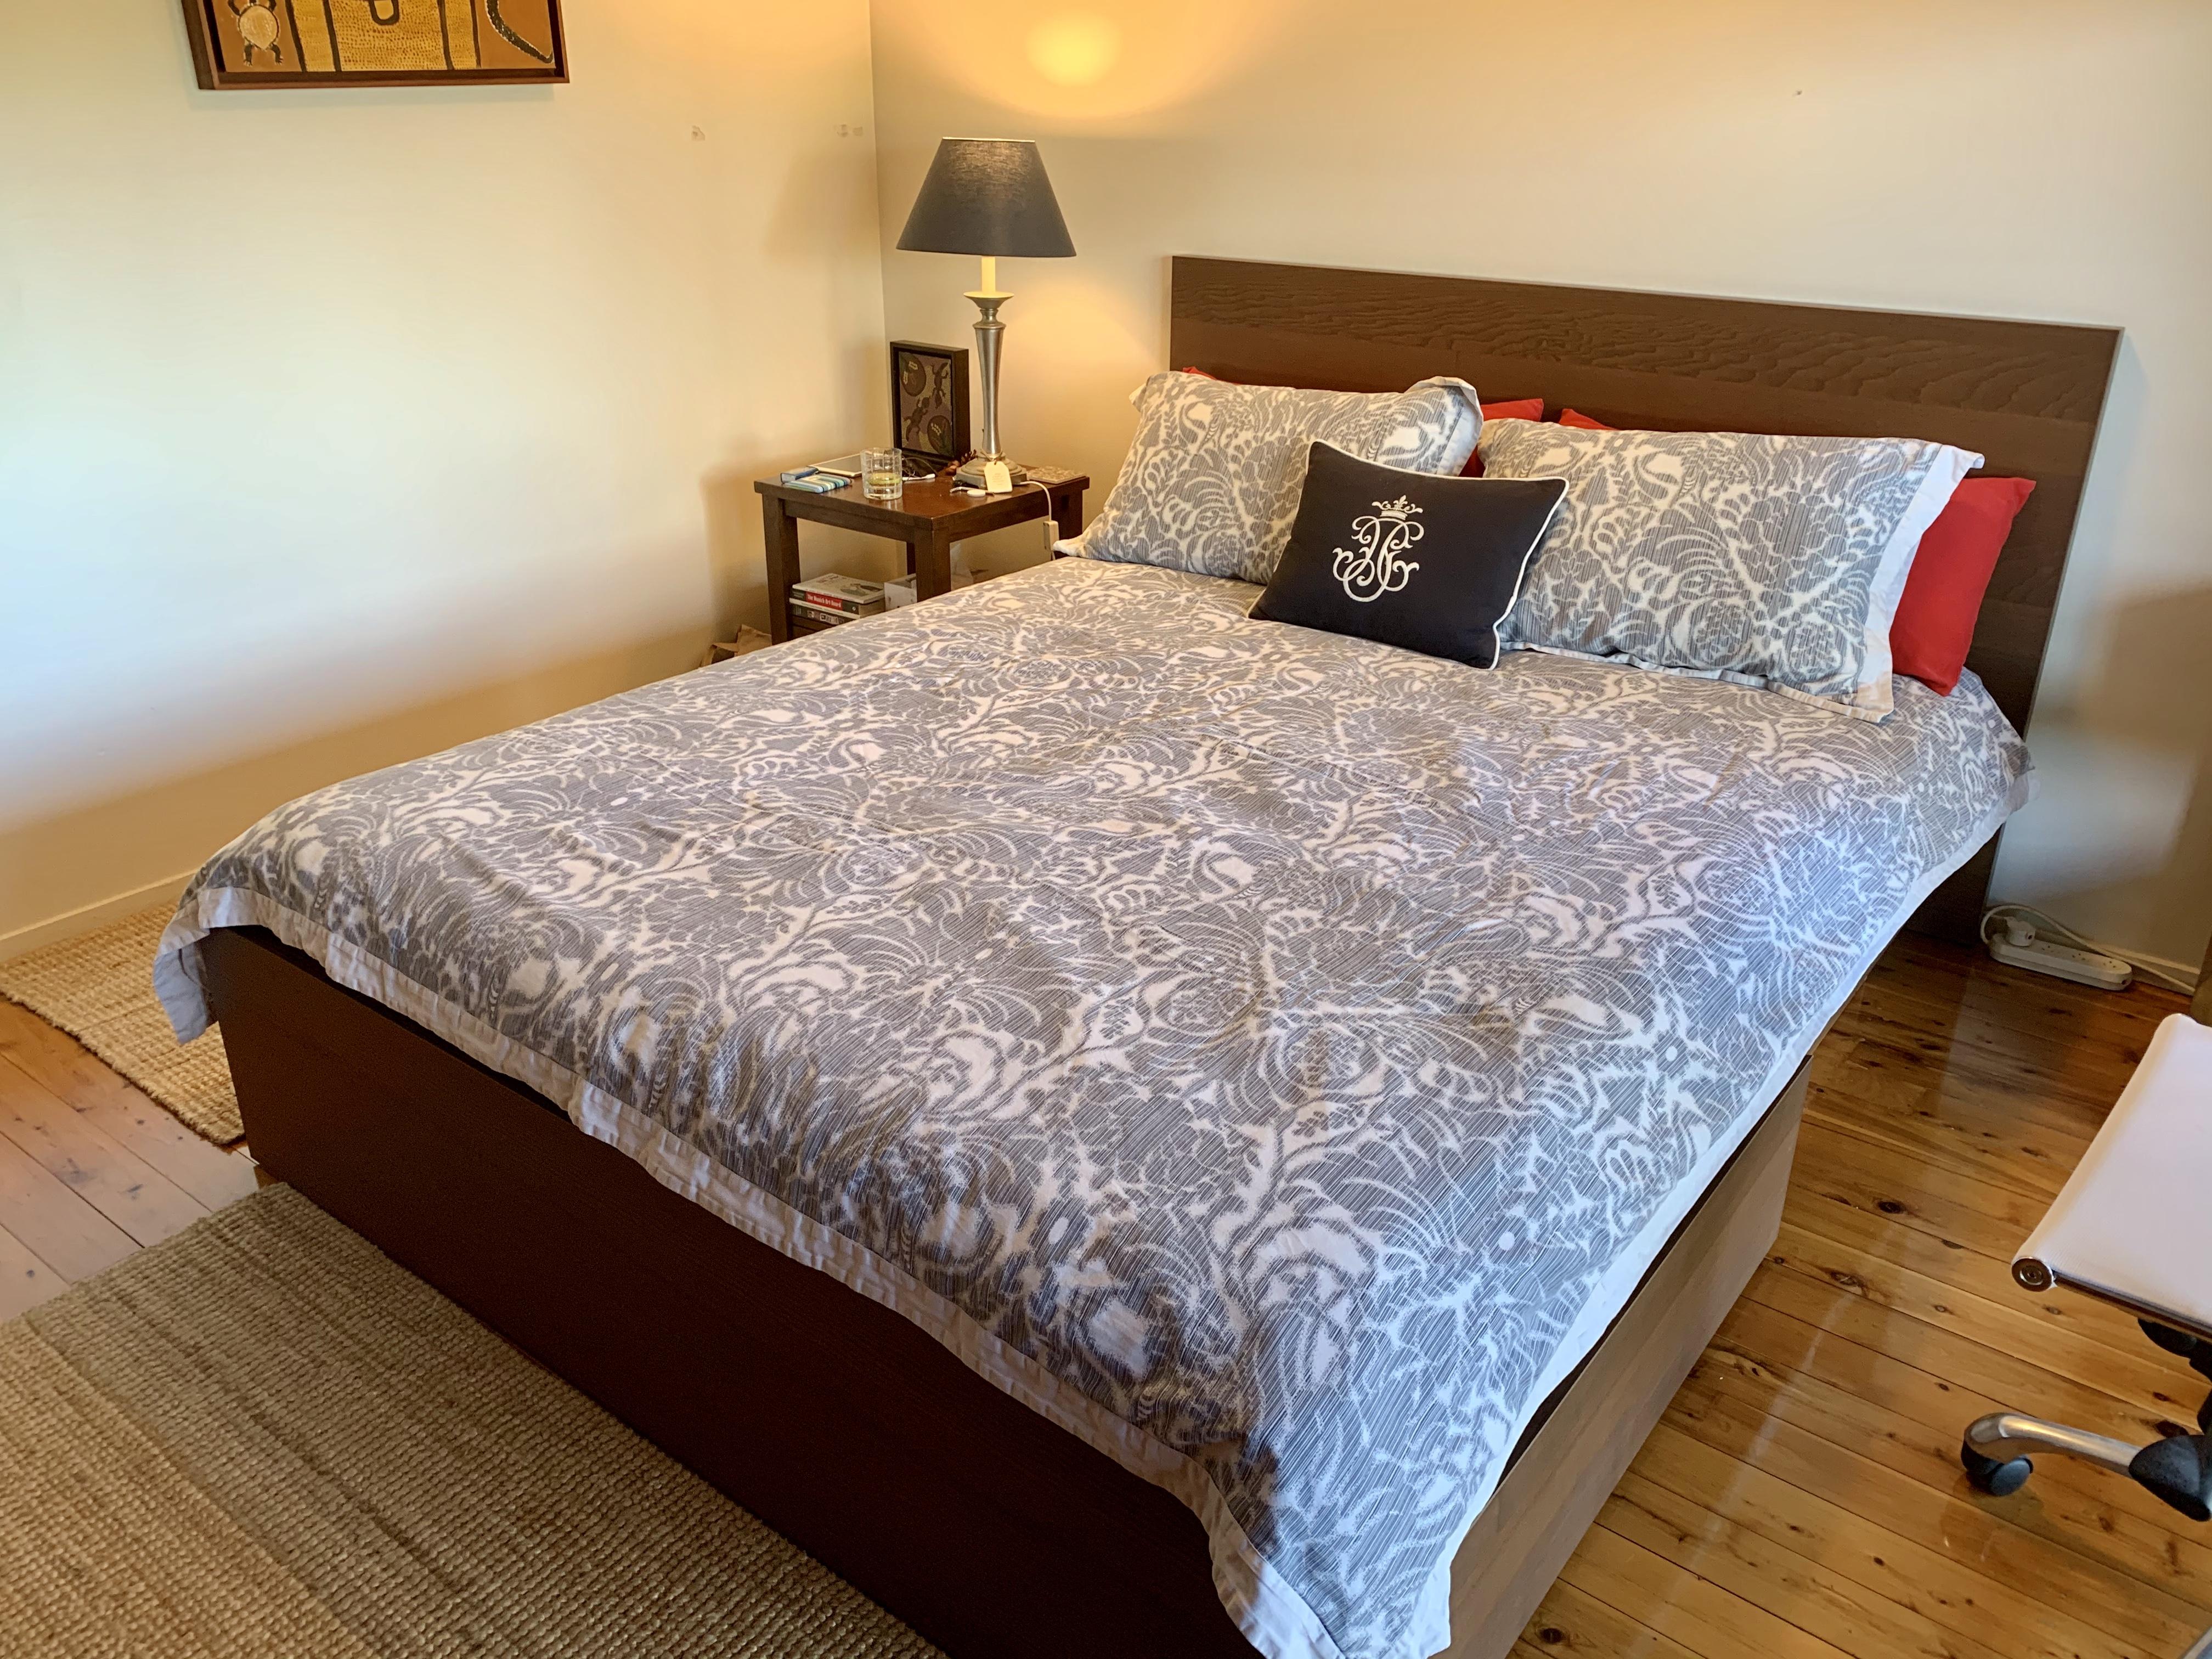 File Malm Bed From Ikea Brisbane Australia Jpg Wikimedia Commons